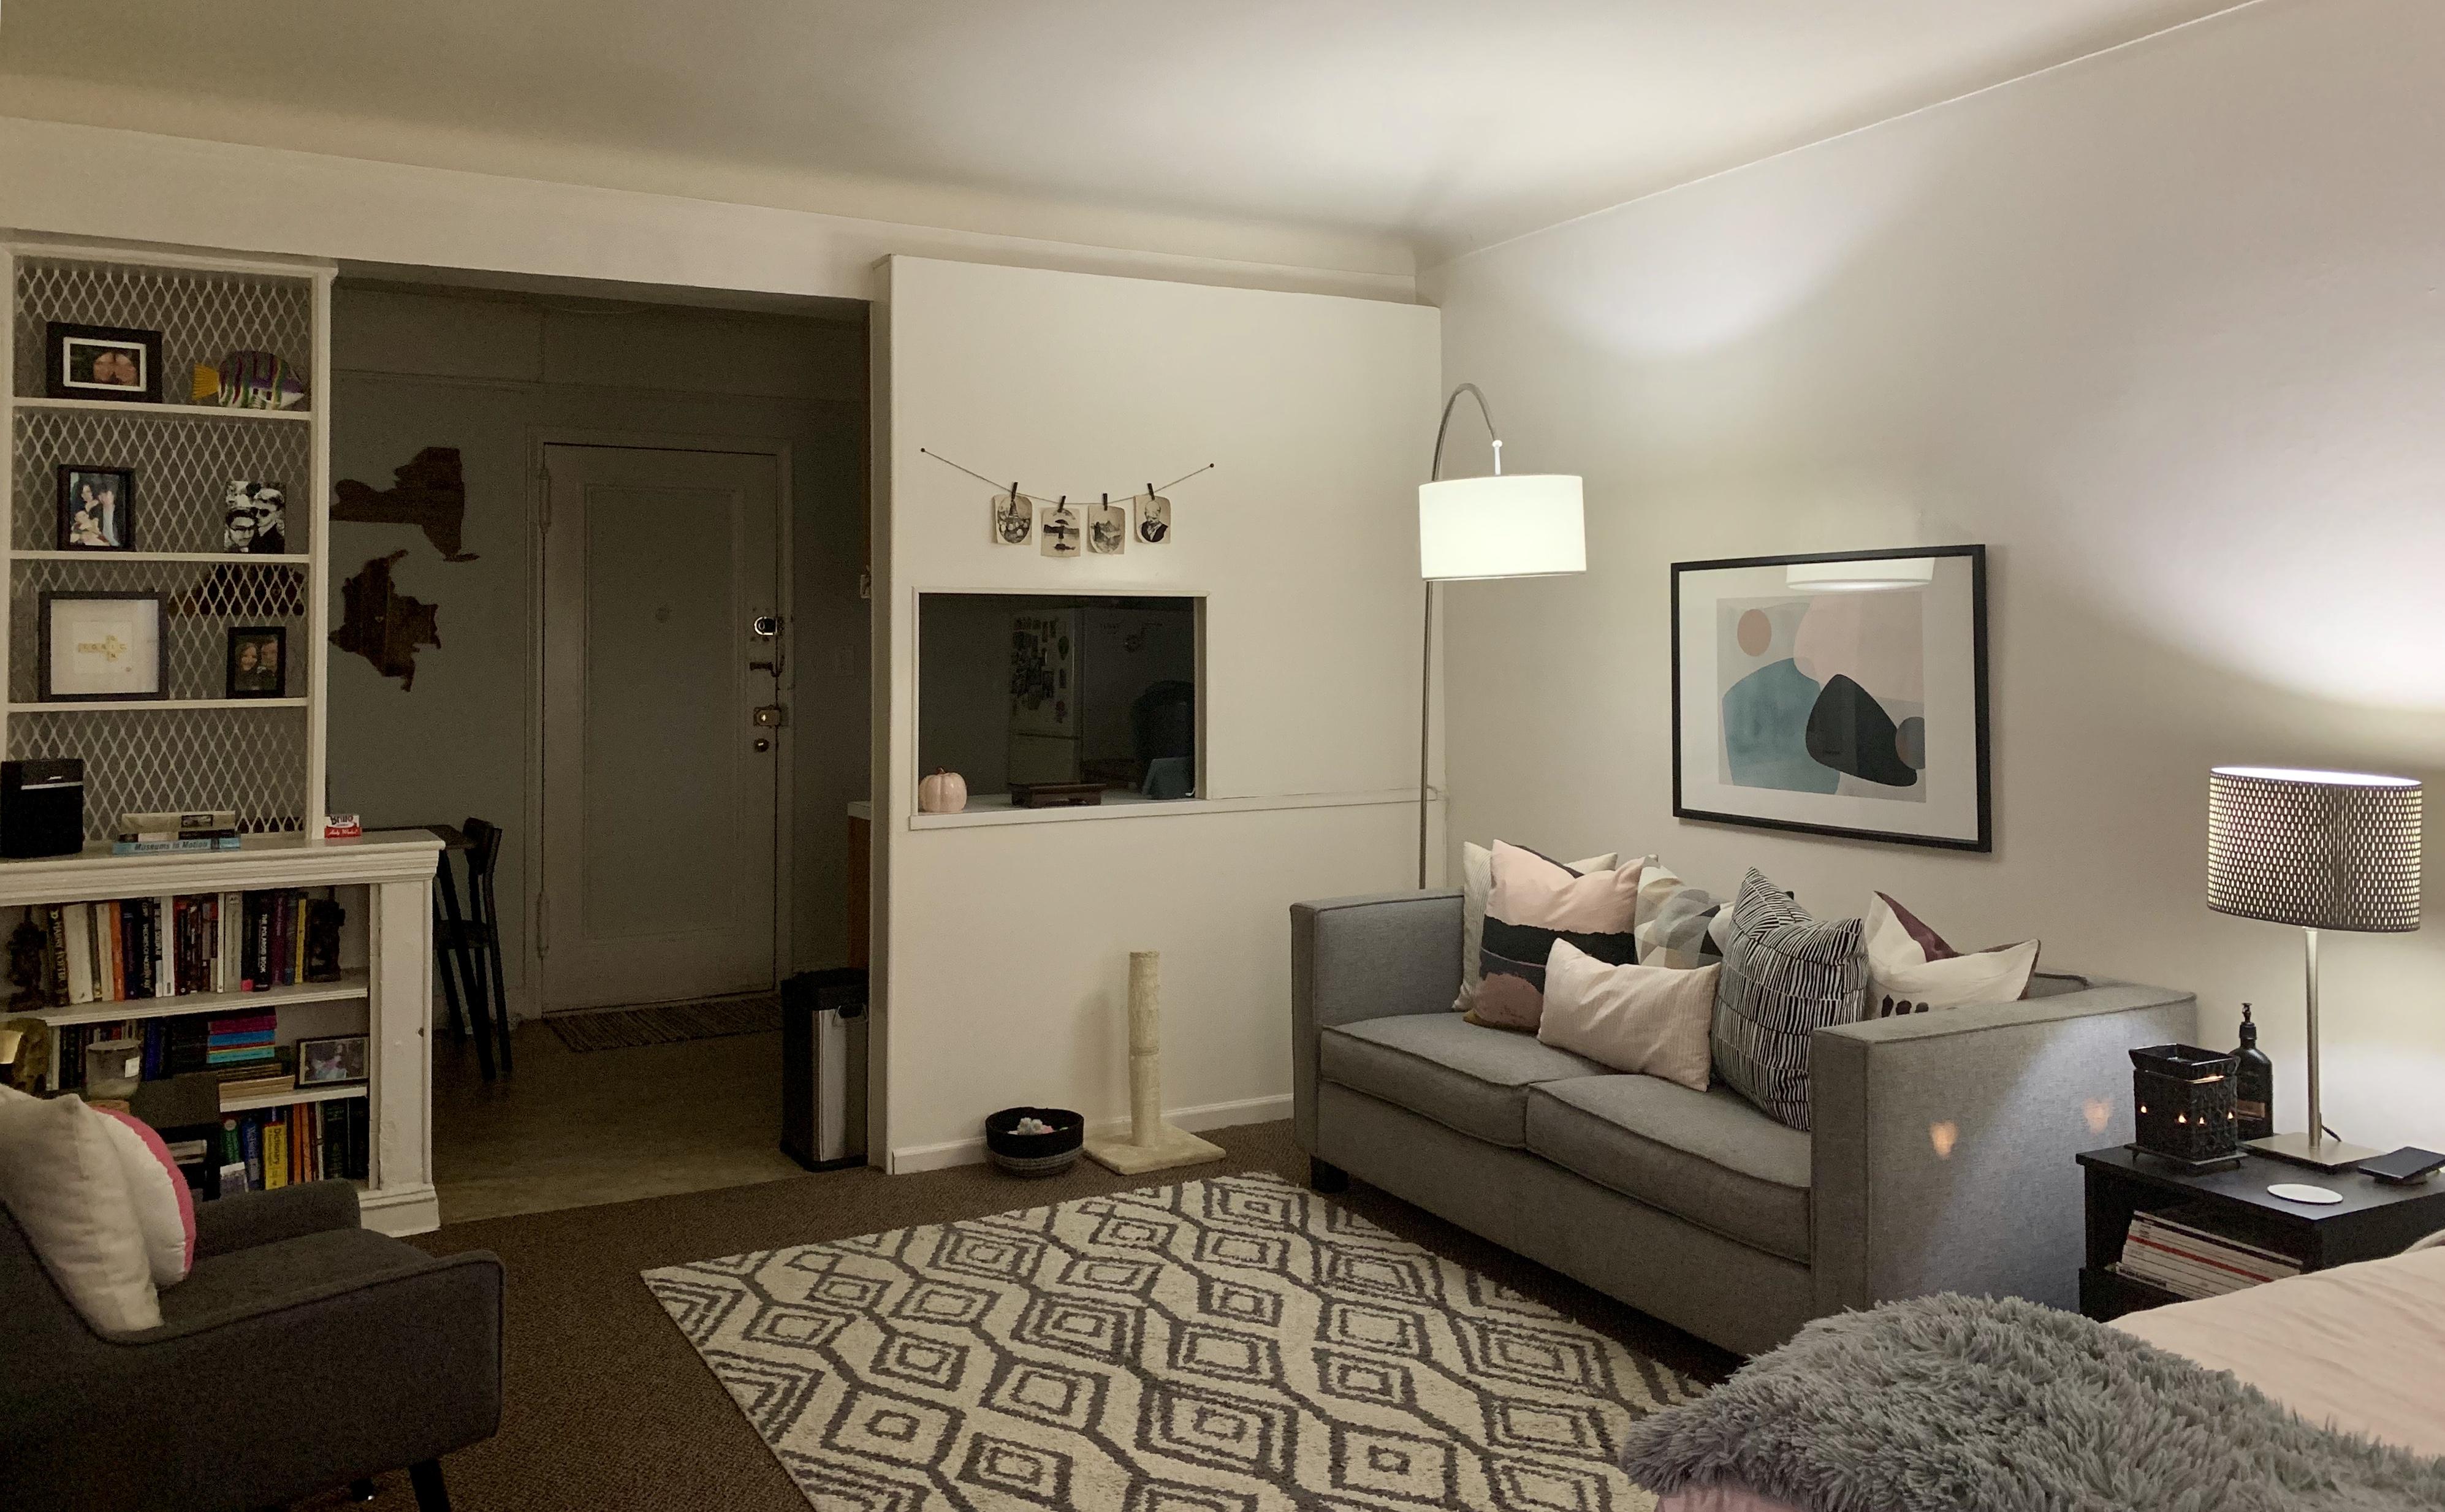 My Boyfriend And I Live In A 500 Square Foot Studio Here S How We Make It Work,Teak Wood Main Door Simple Design